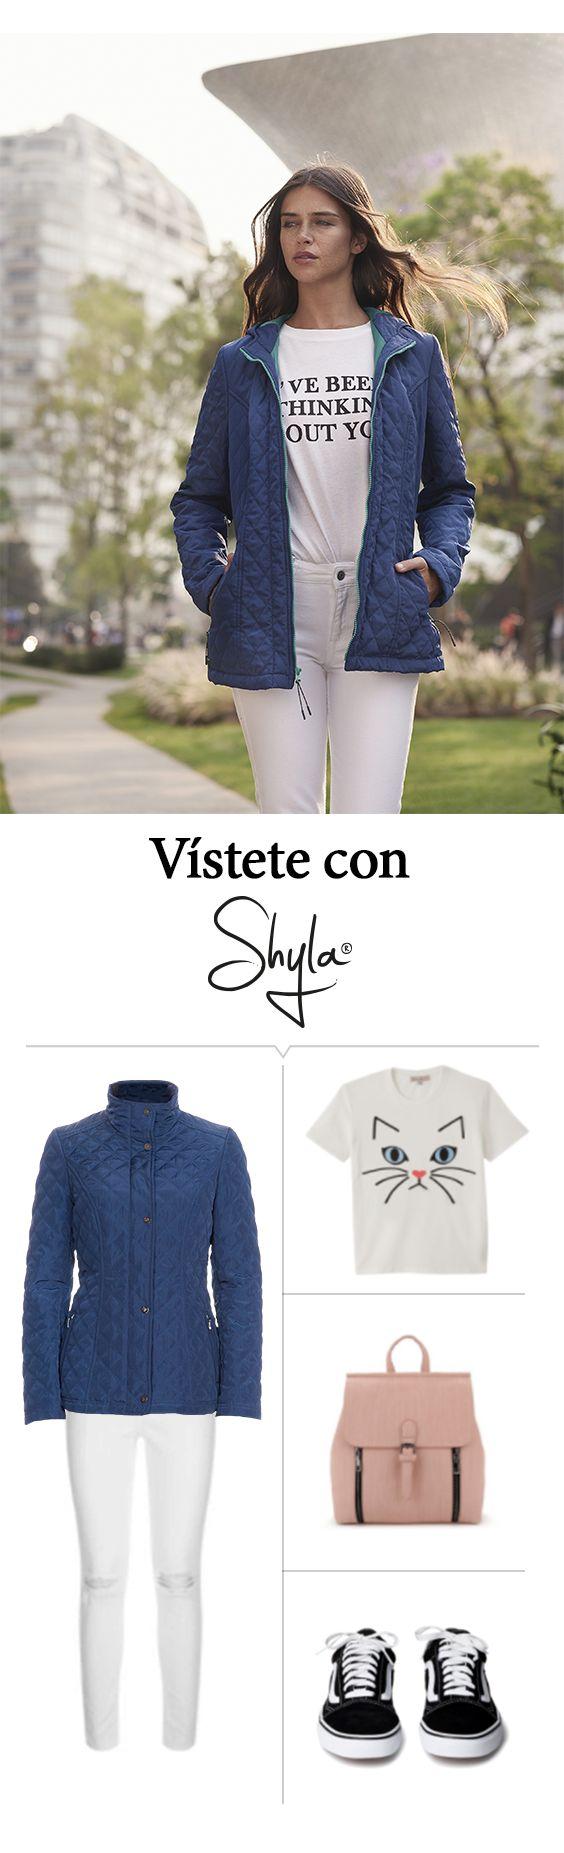 #ShylaMx #Lightwear #Abrigo #Winter #Look #Fashion #Woman #FashionTip #Fashion #Moda #Mujer #Ciudad #México #Coat #OOTD #Outfit #Inspiración #Carbón #Azul #Charcoal #Blue #StreetStyle #Chamarra